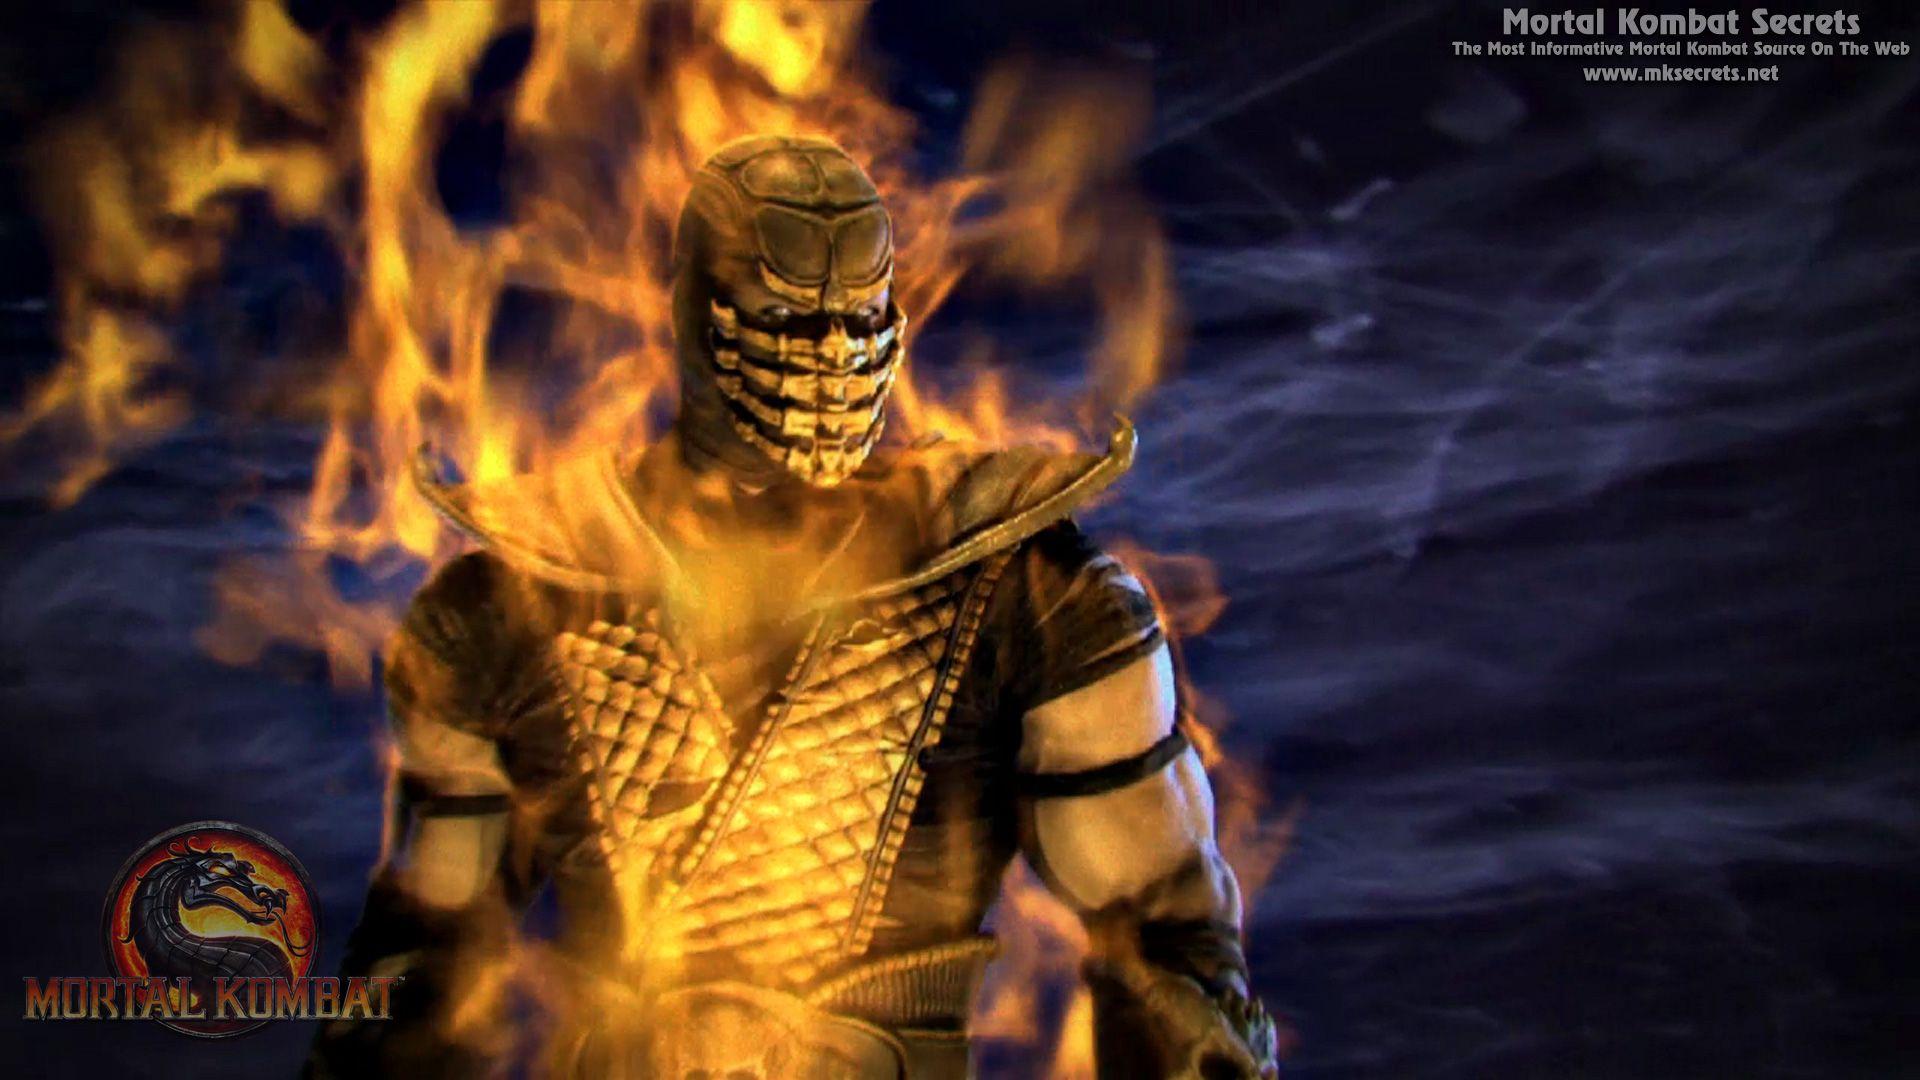 Mortal Kombat 9 Wallpapers Wallpapers 2020 Check More At Https